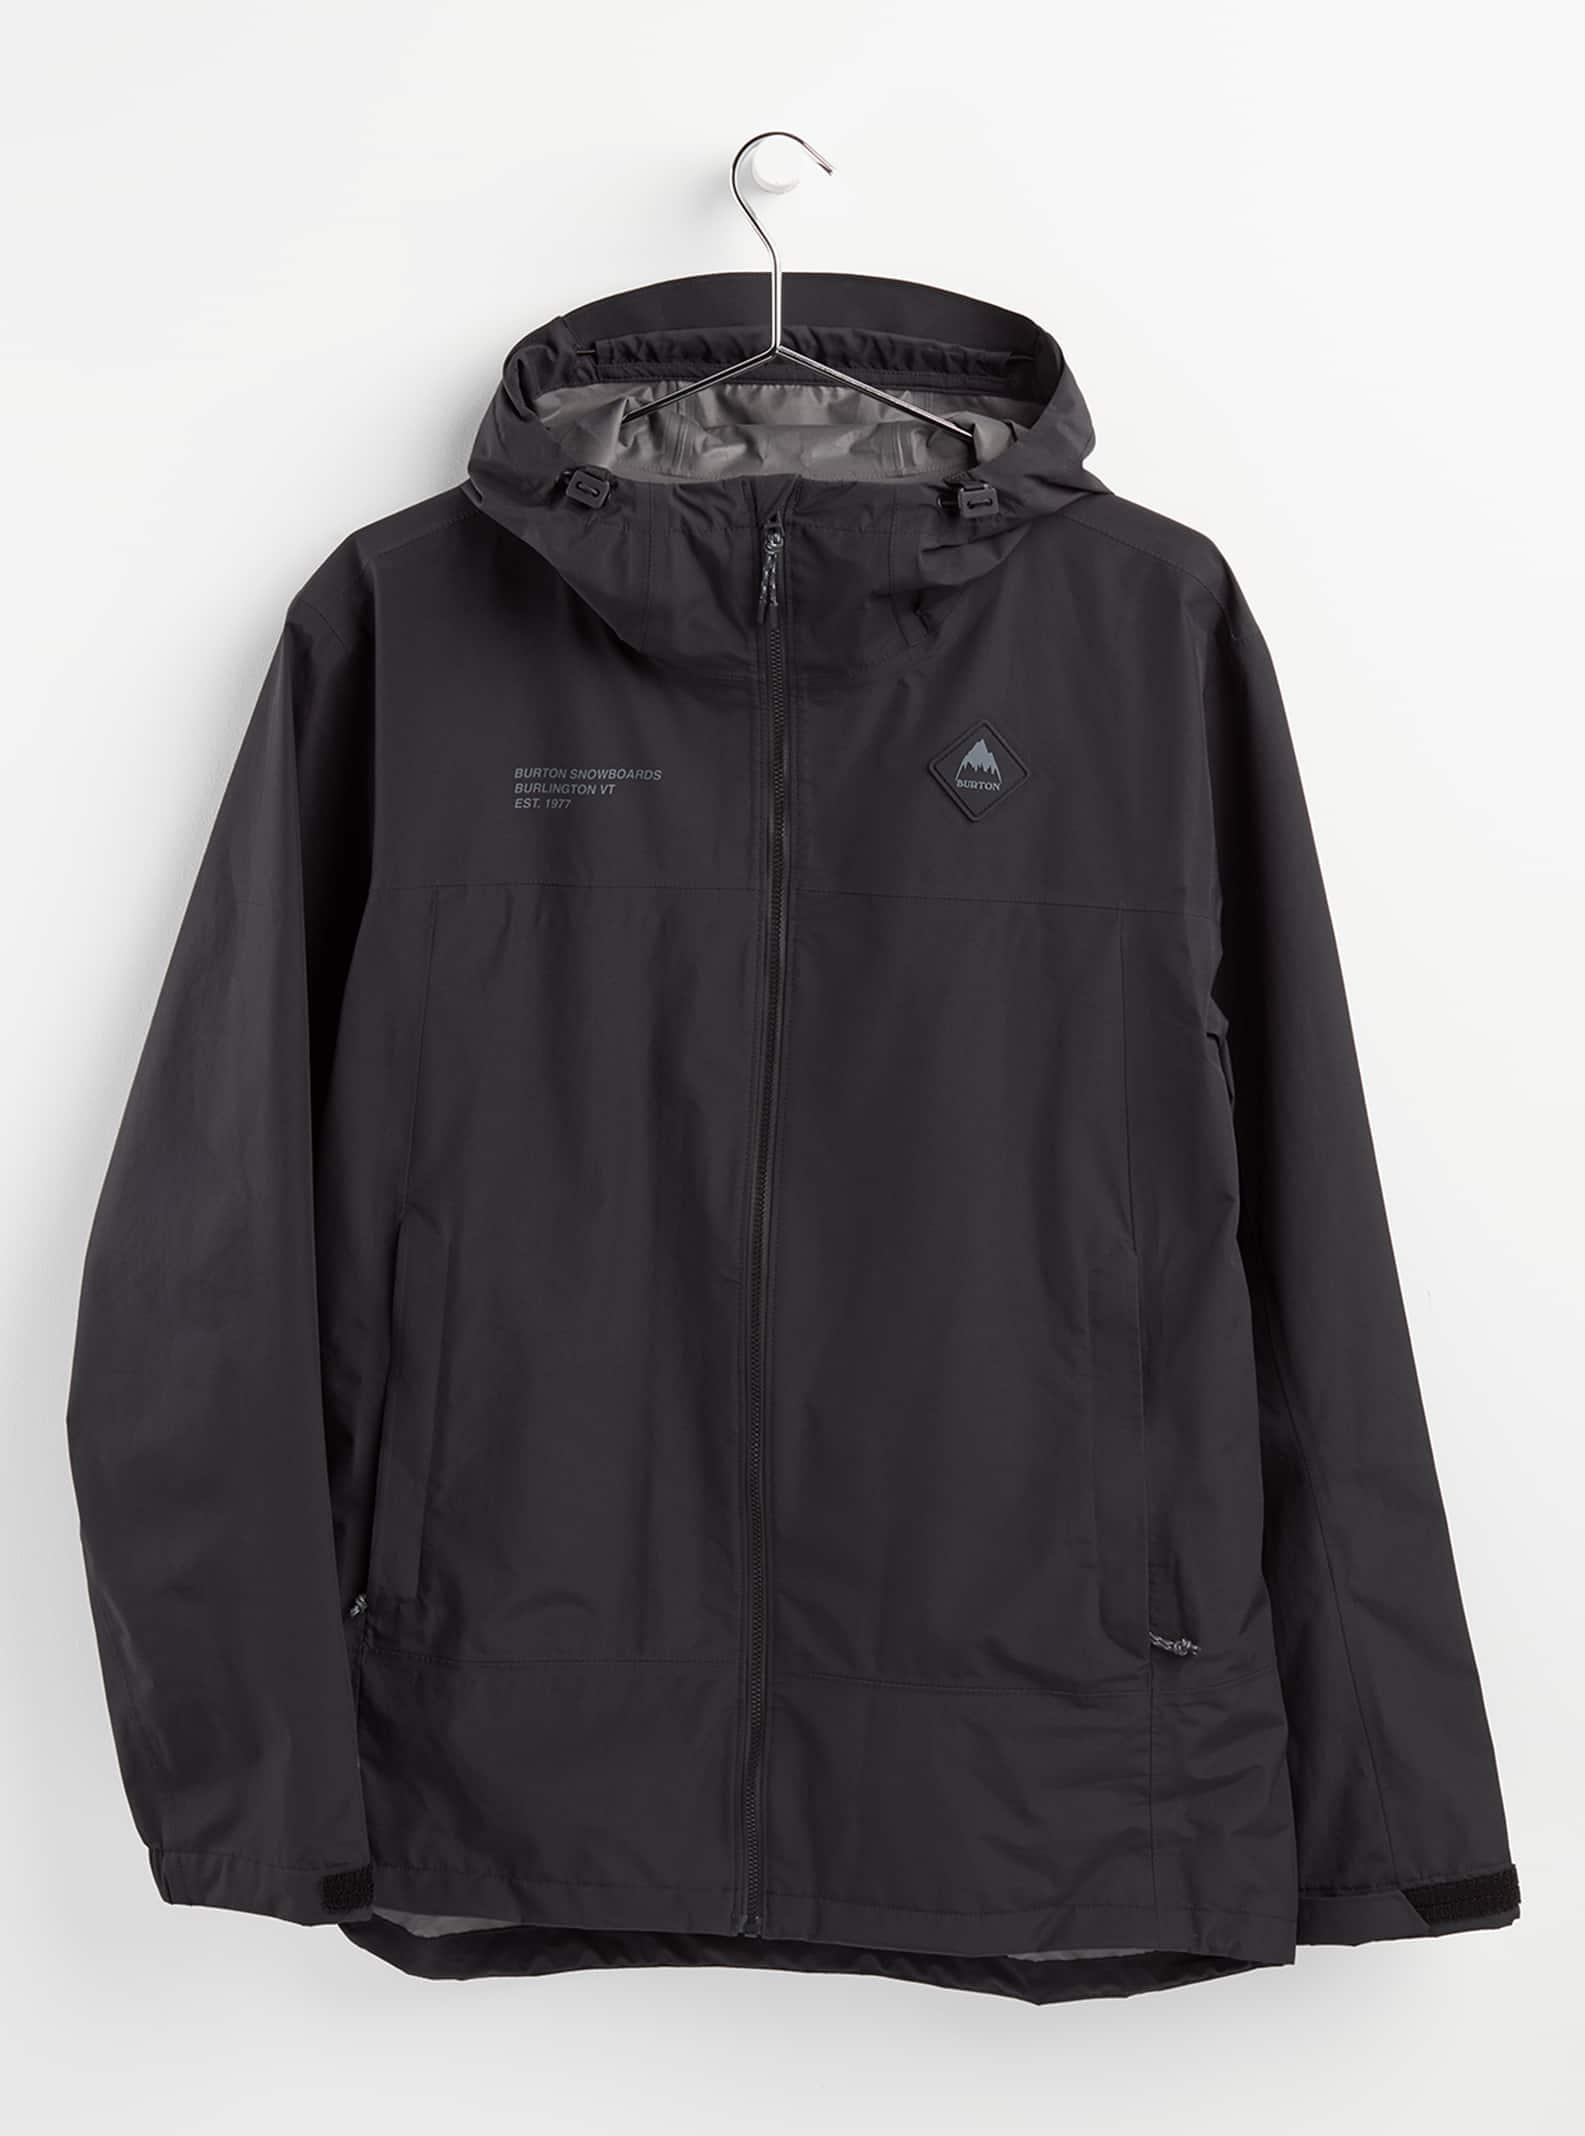 Men's Outerwear Burton Men's GORE-TEX Packrite Rain Jacket, XS